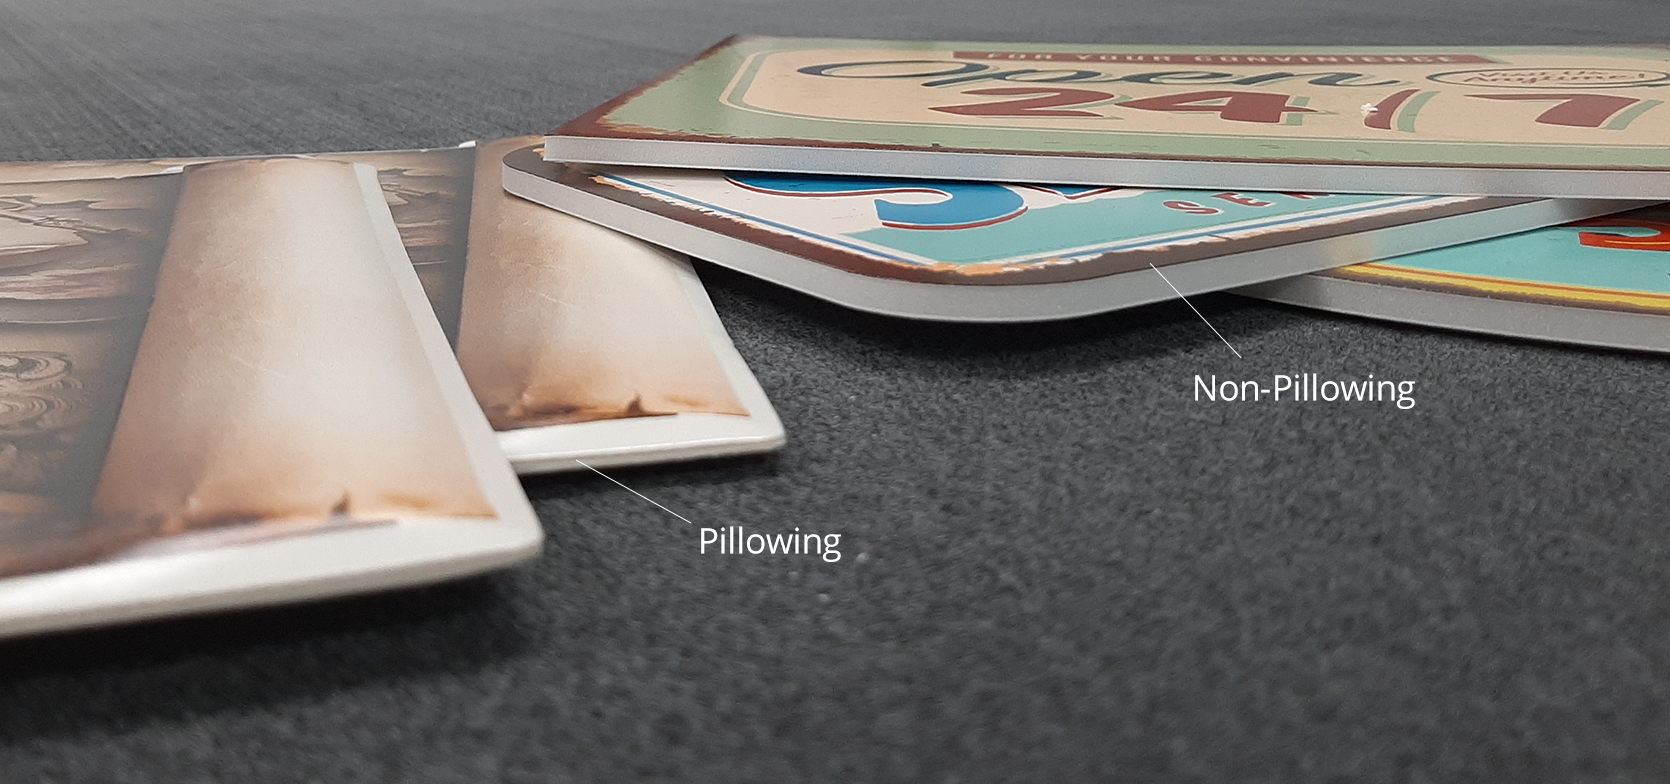 Pillowing-NonPillowing